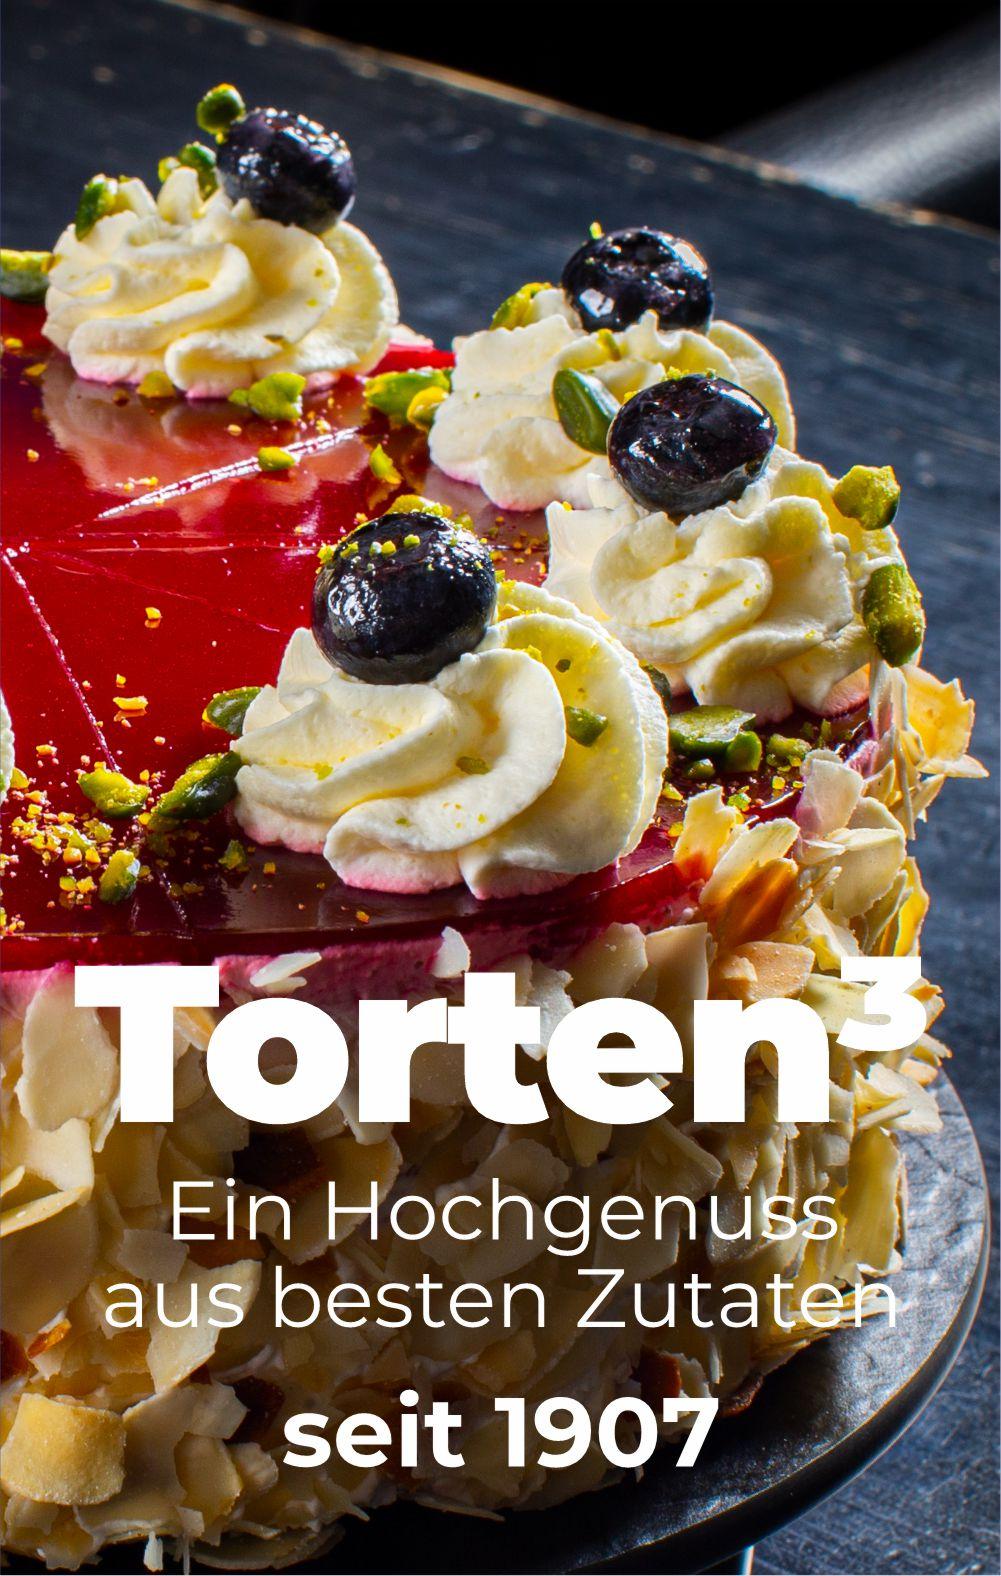 tismes_torten_004_xs